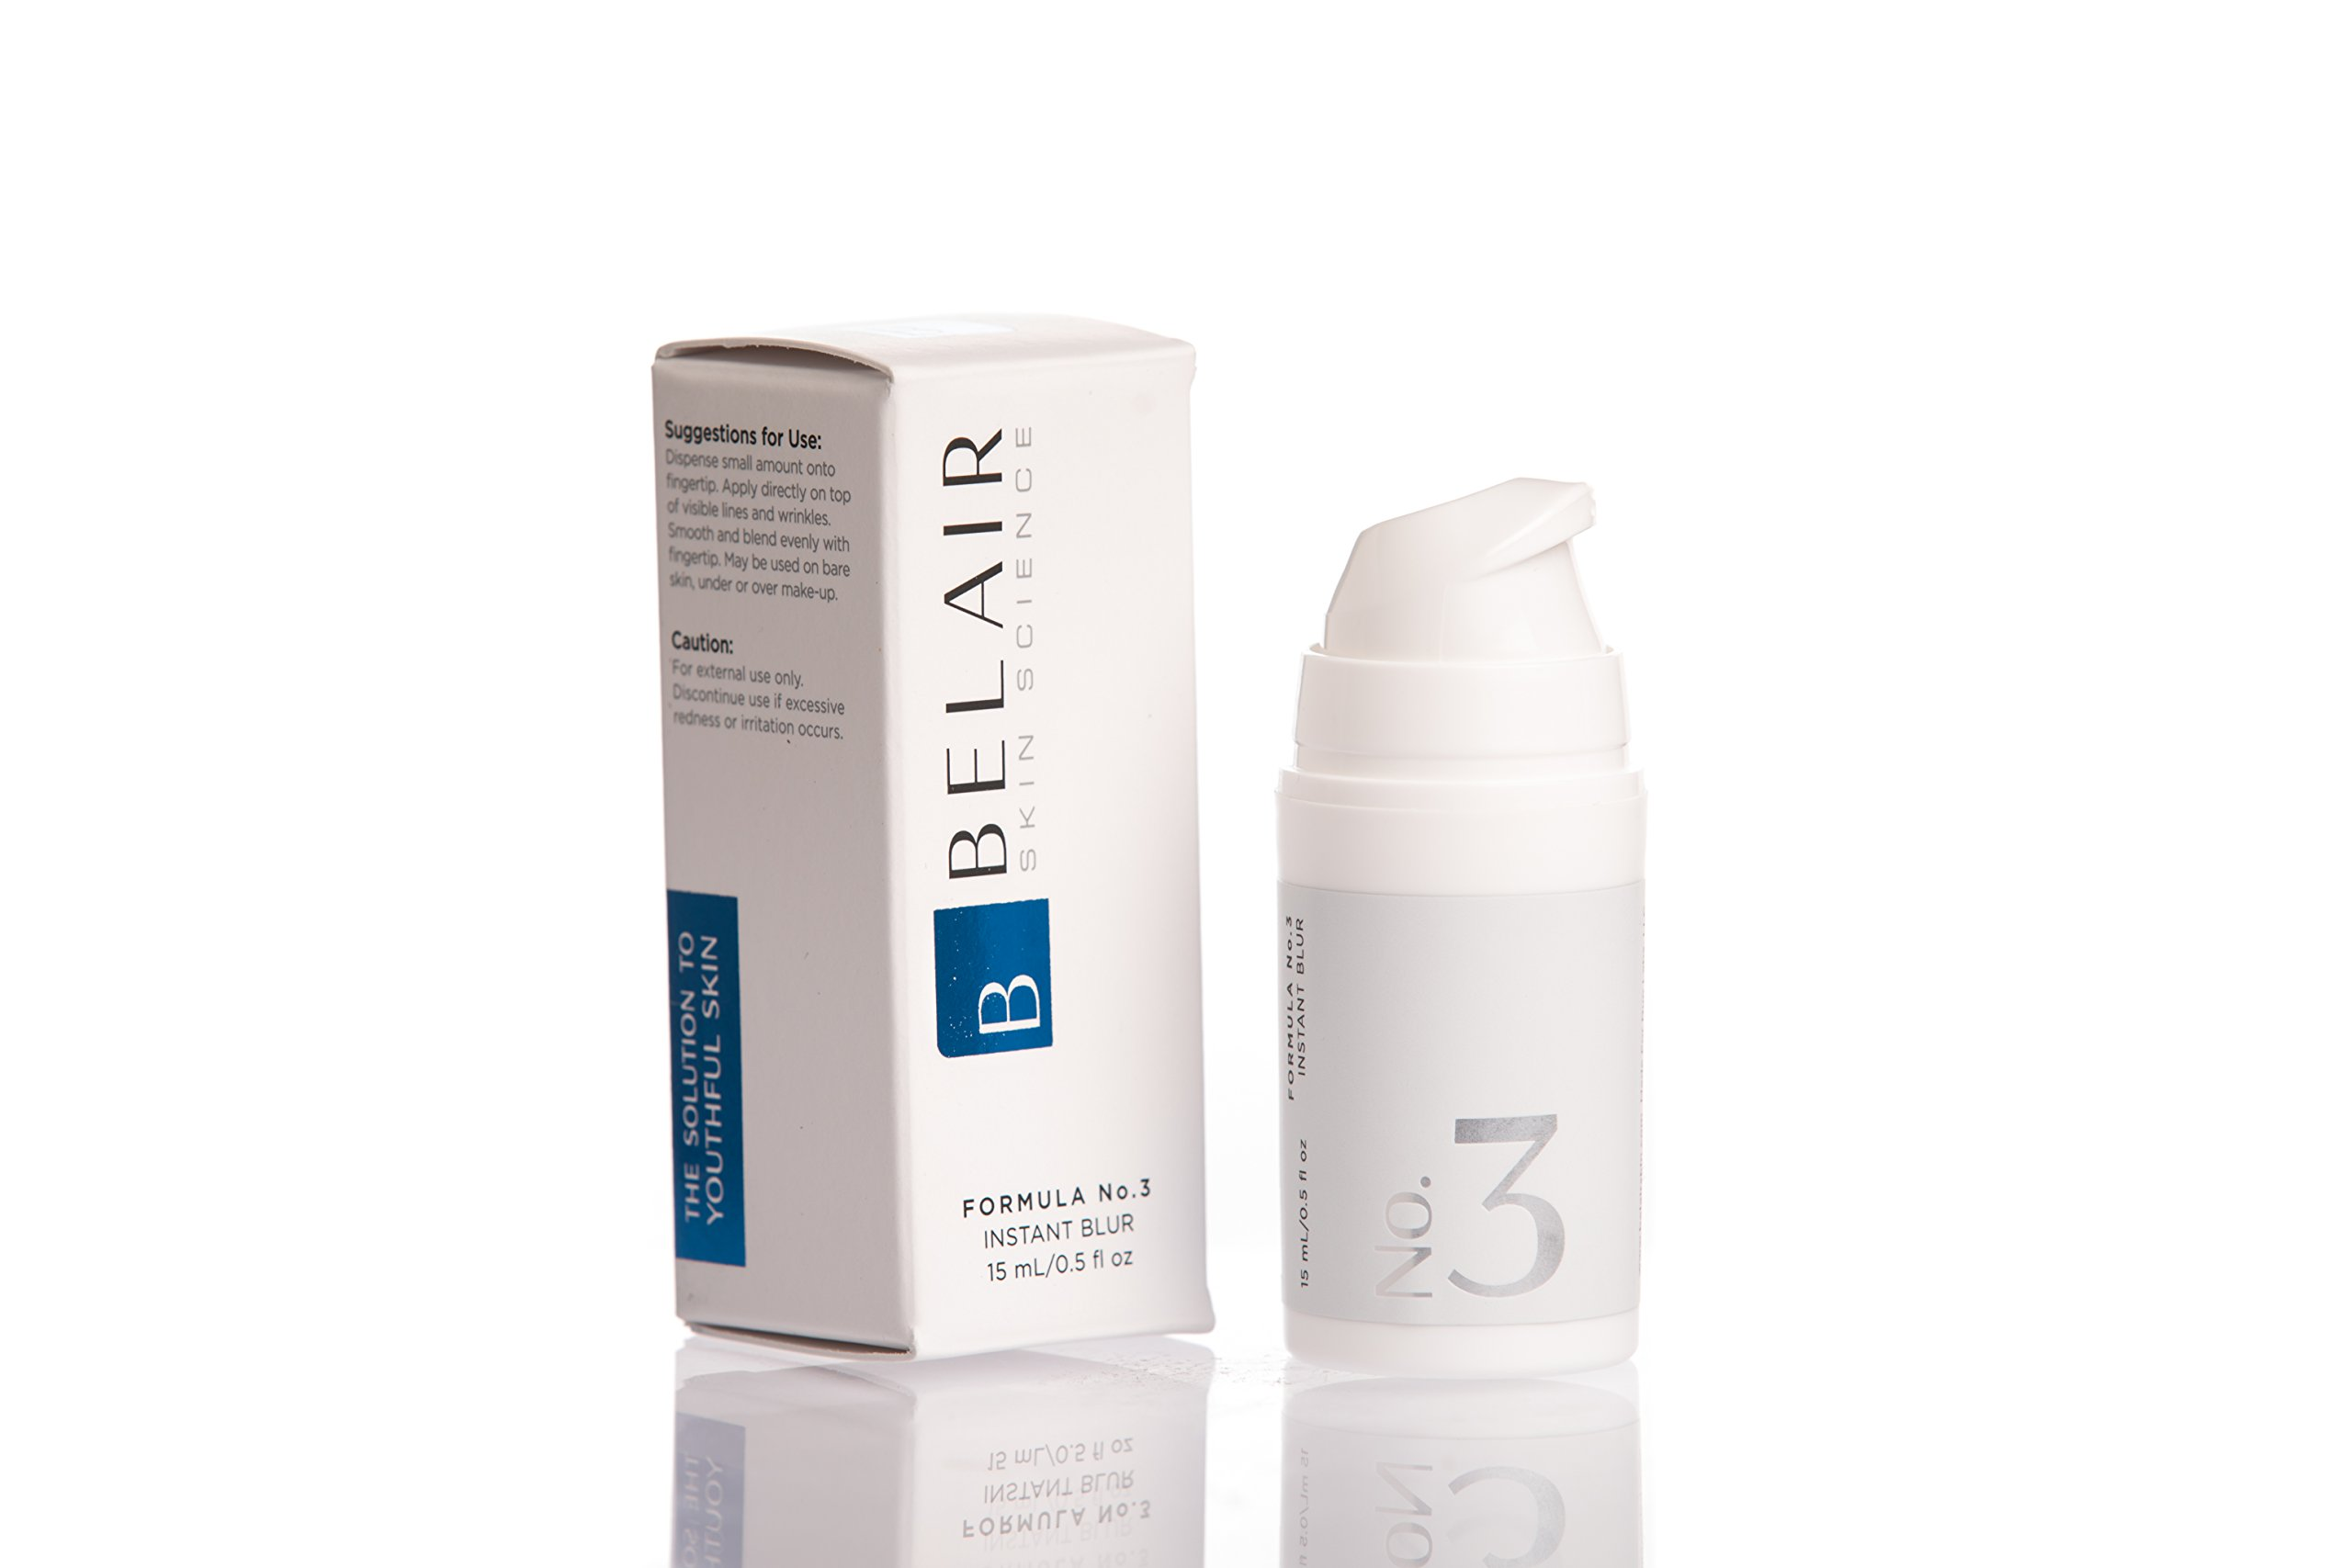 Bel Air Skin Science Formula No. 3 Instant Blur